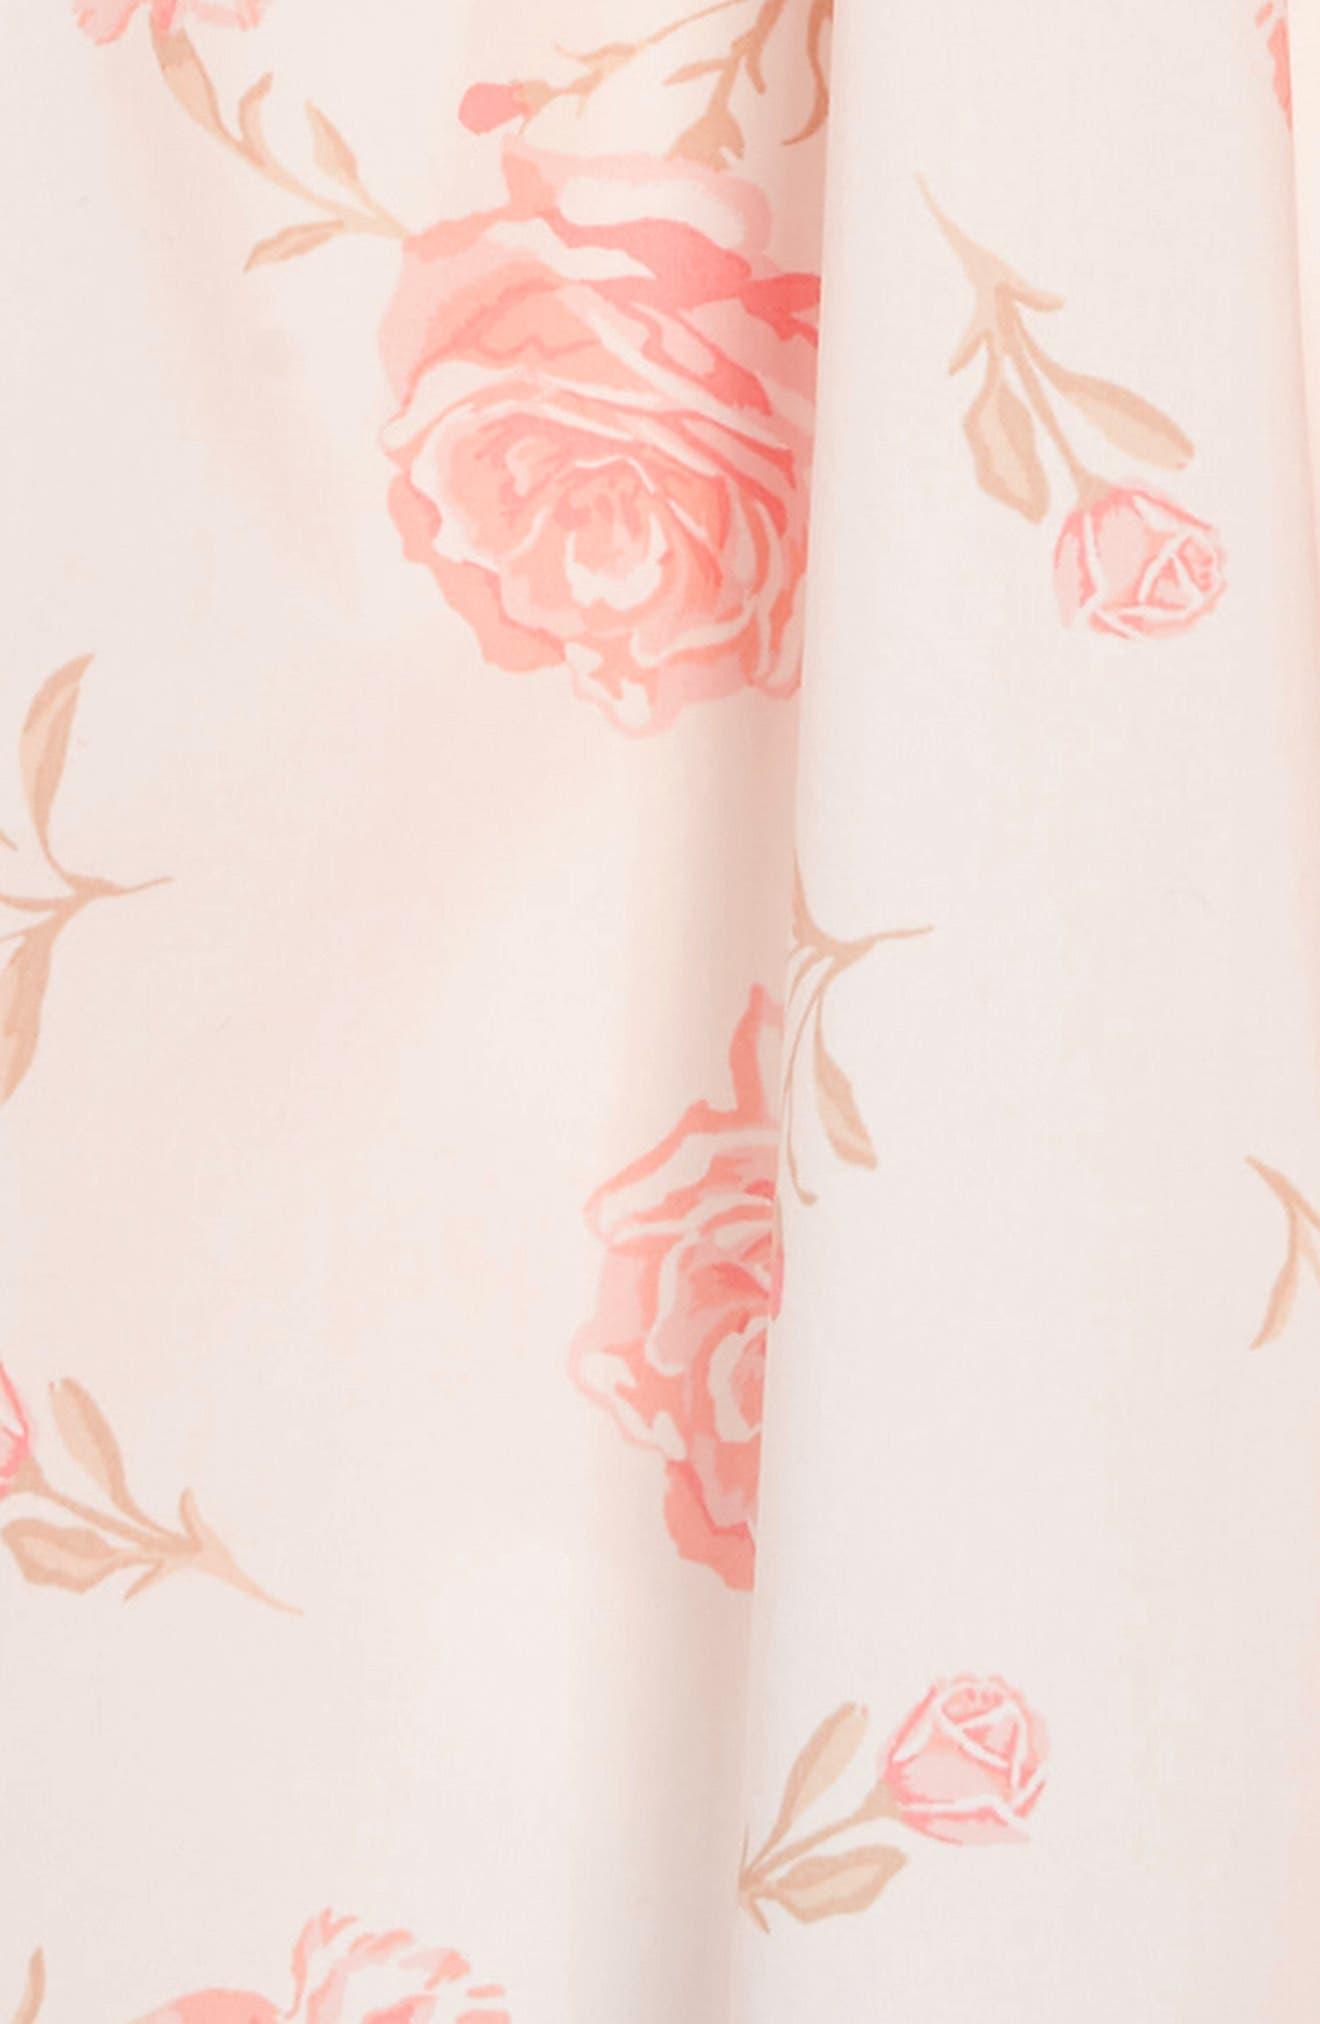 RUBY & BLOOM,                             Lovely Lace Dress,                             Alternate thumbnail 3, color,                             IVORY EGRET ELEGANT FLORAL